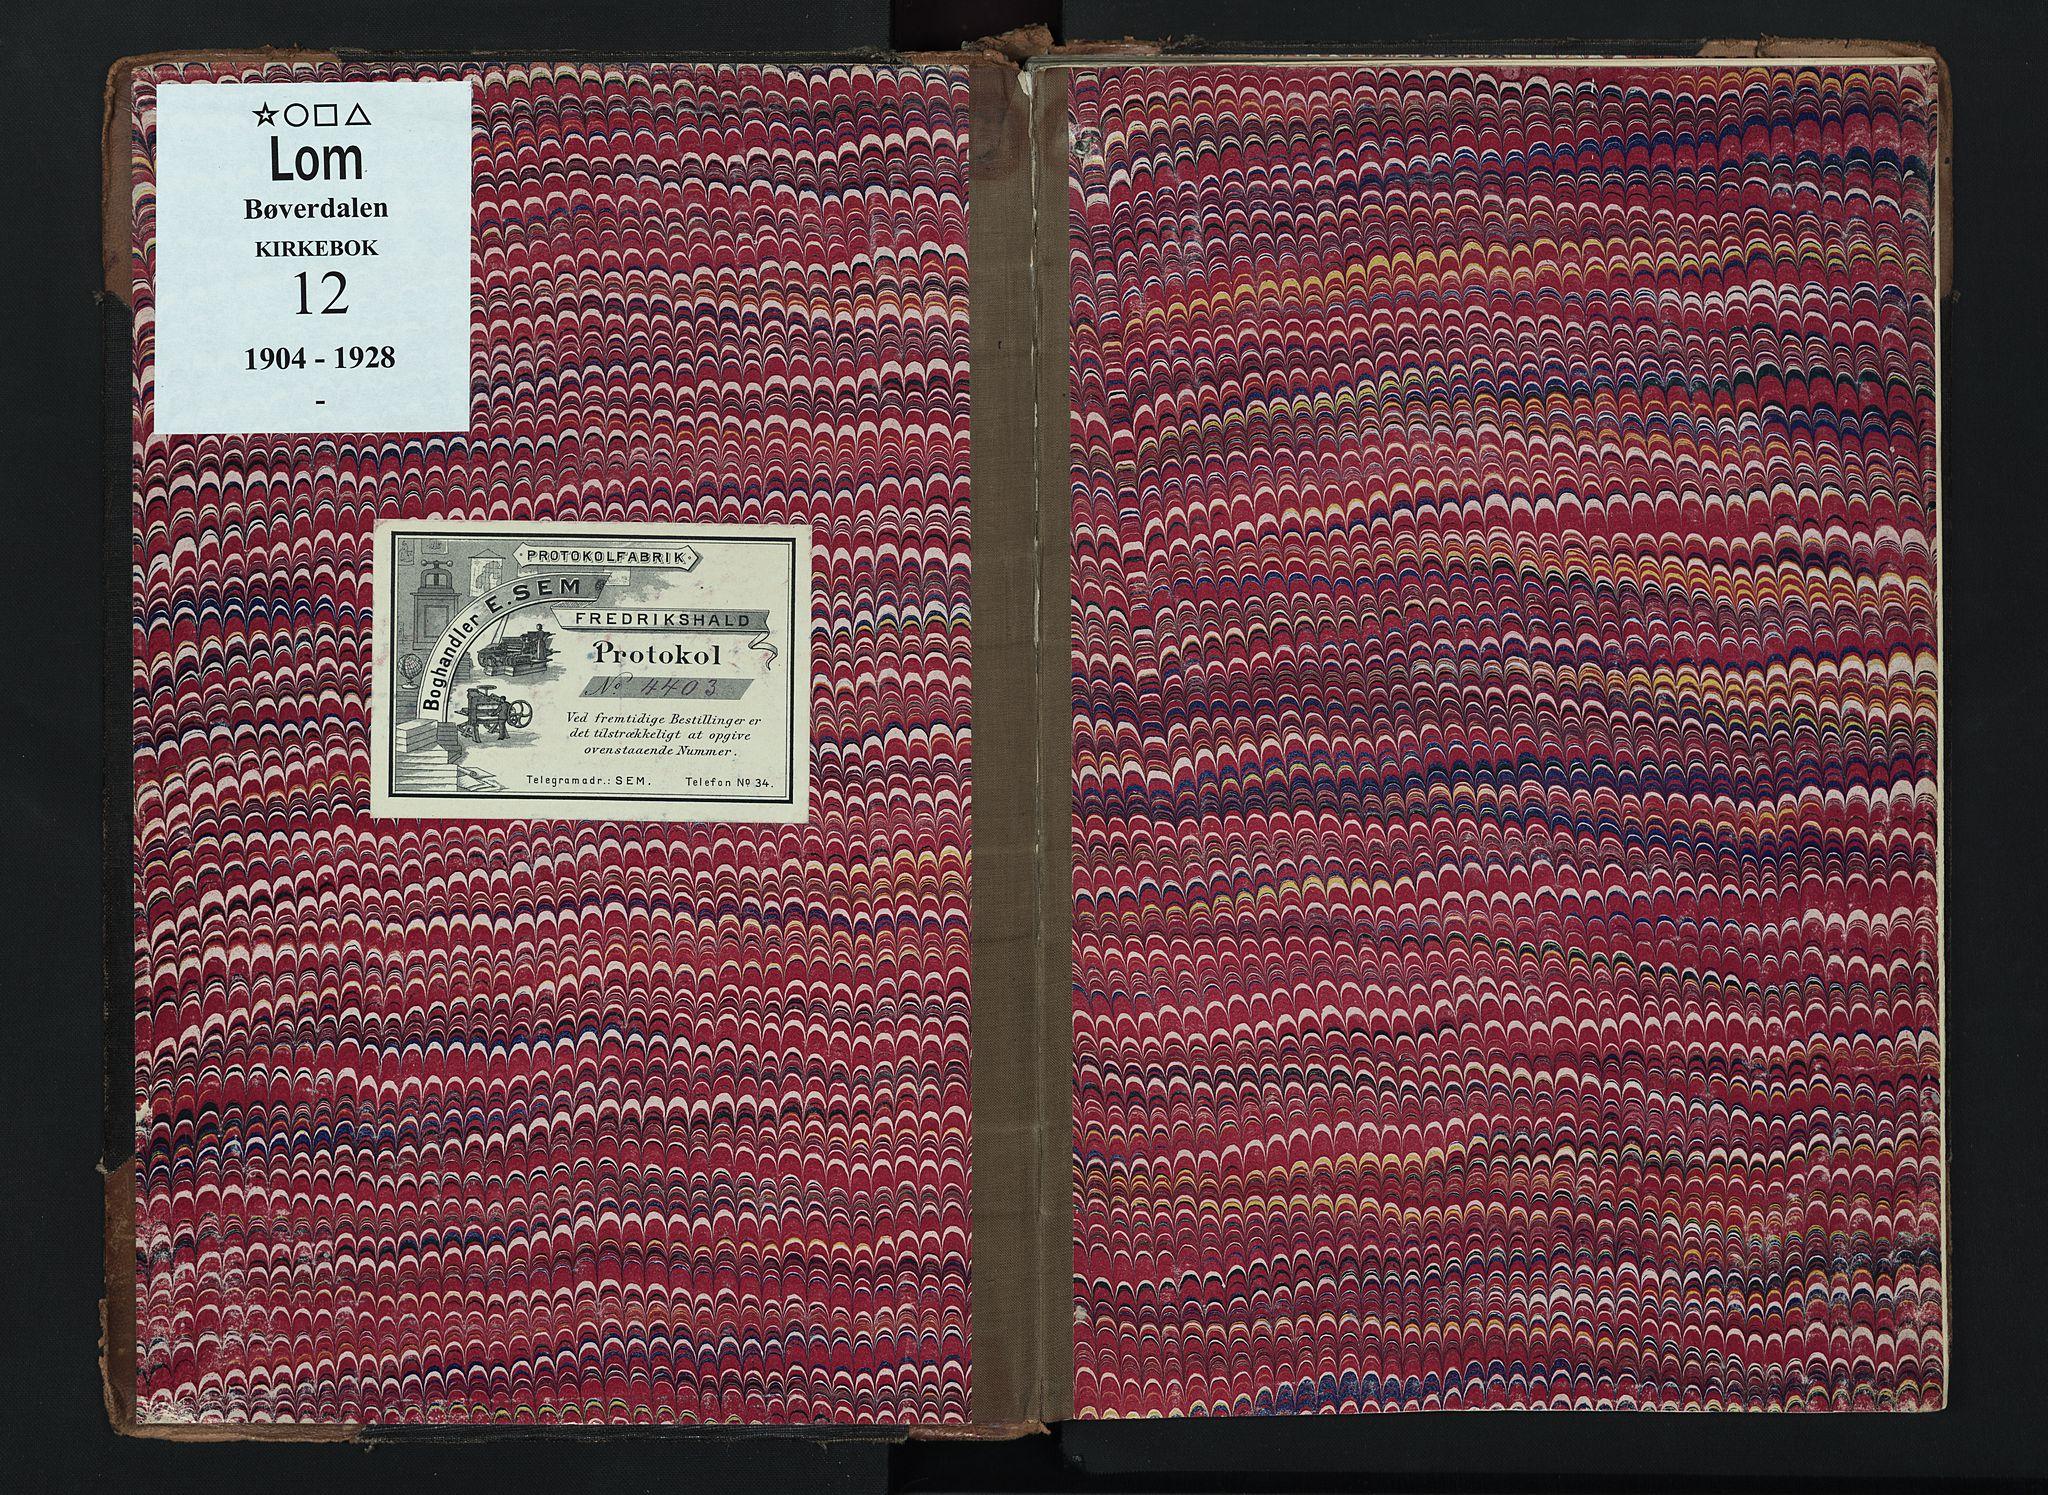 SAH, Lom prestekontor, K/L0012: Ministerialbok nr. 12, 1904-1928